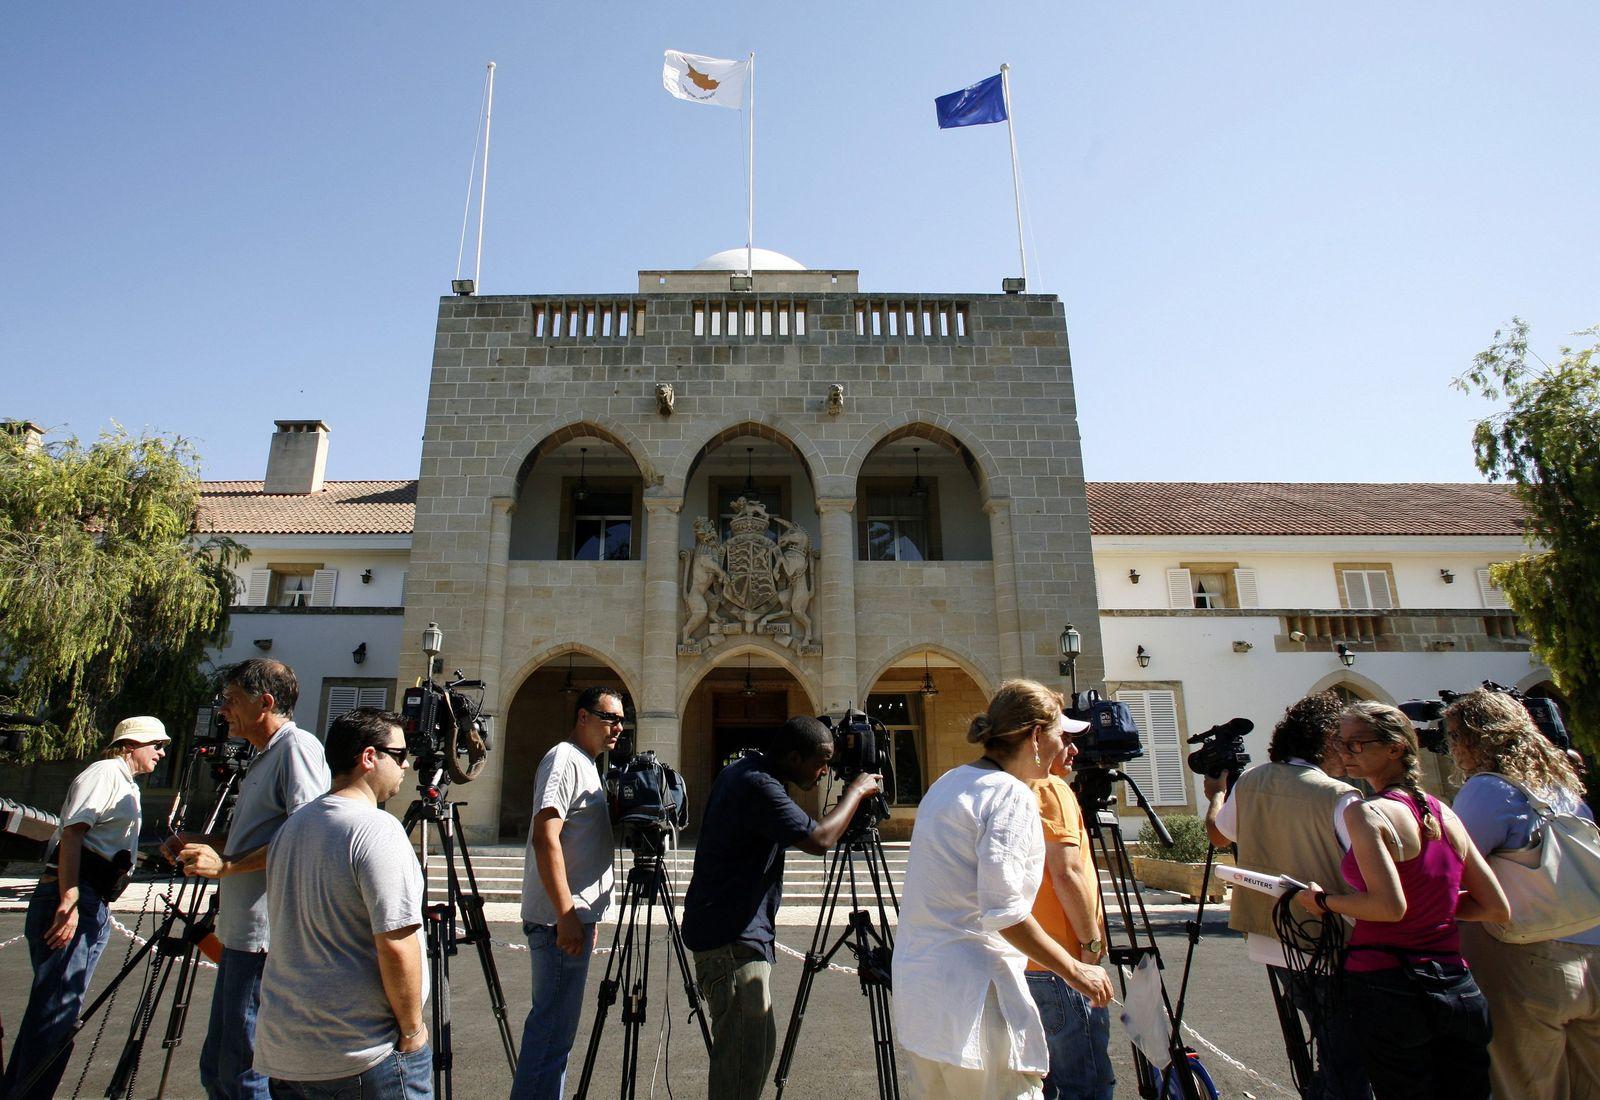 Zypern / EU Praesidentschaft / Palast